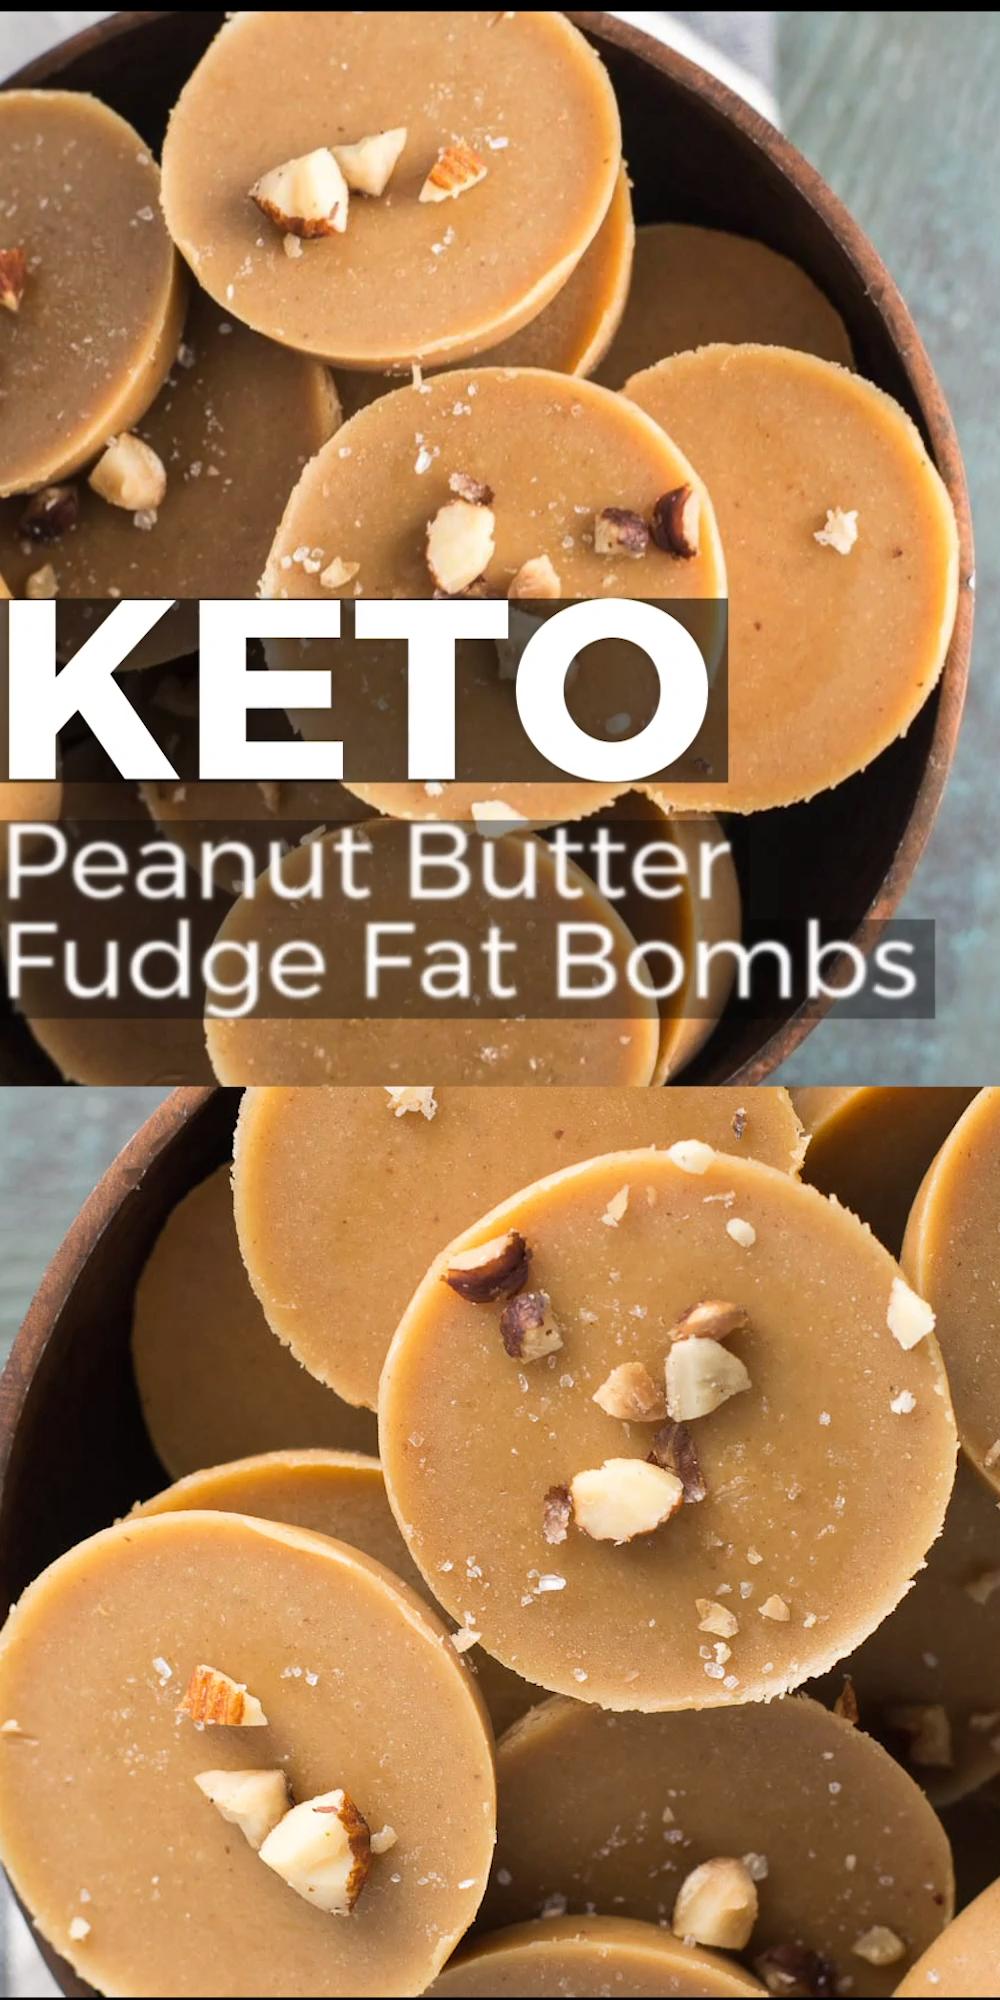 Keto Peanut Butter Fudge Fat Bombs